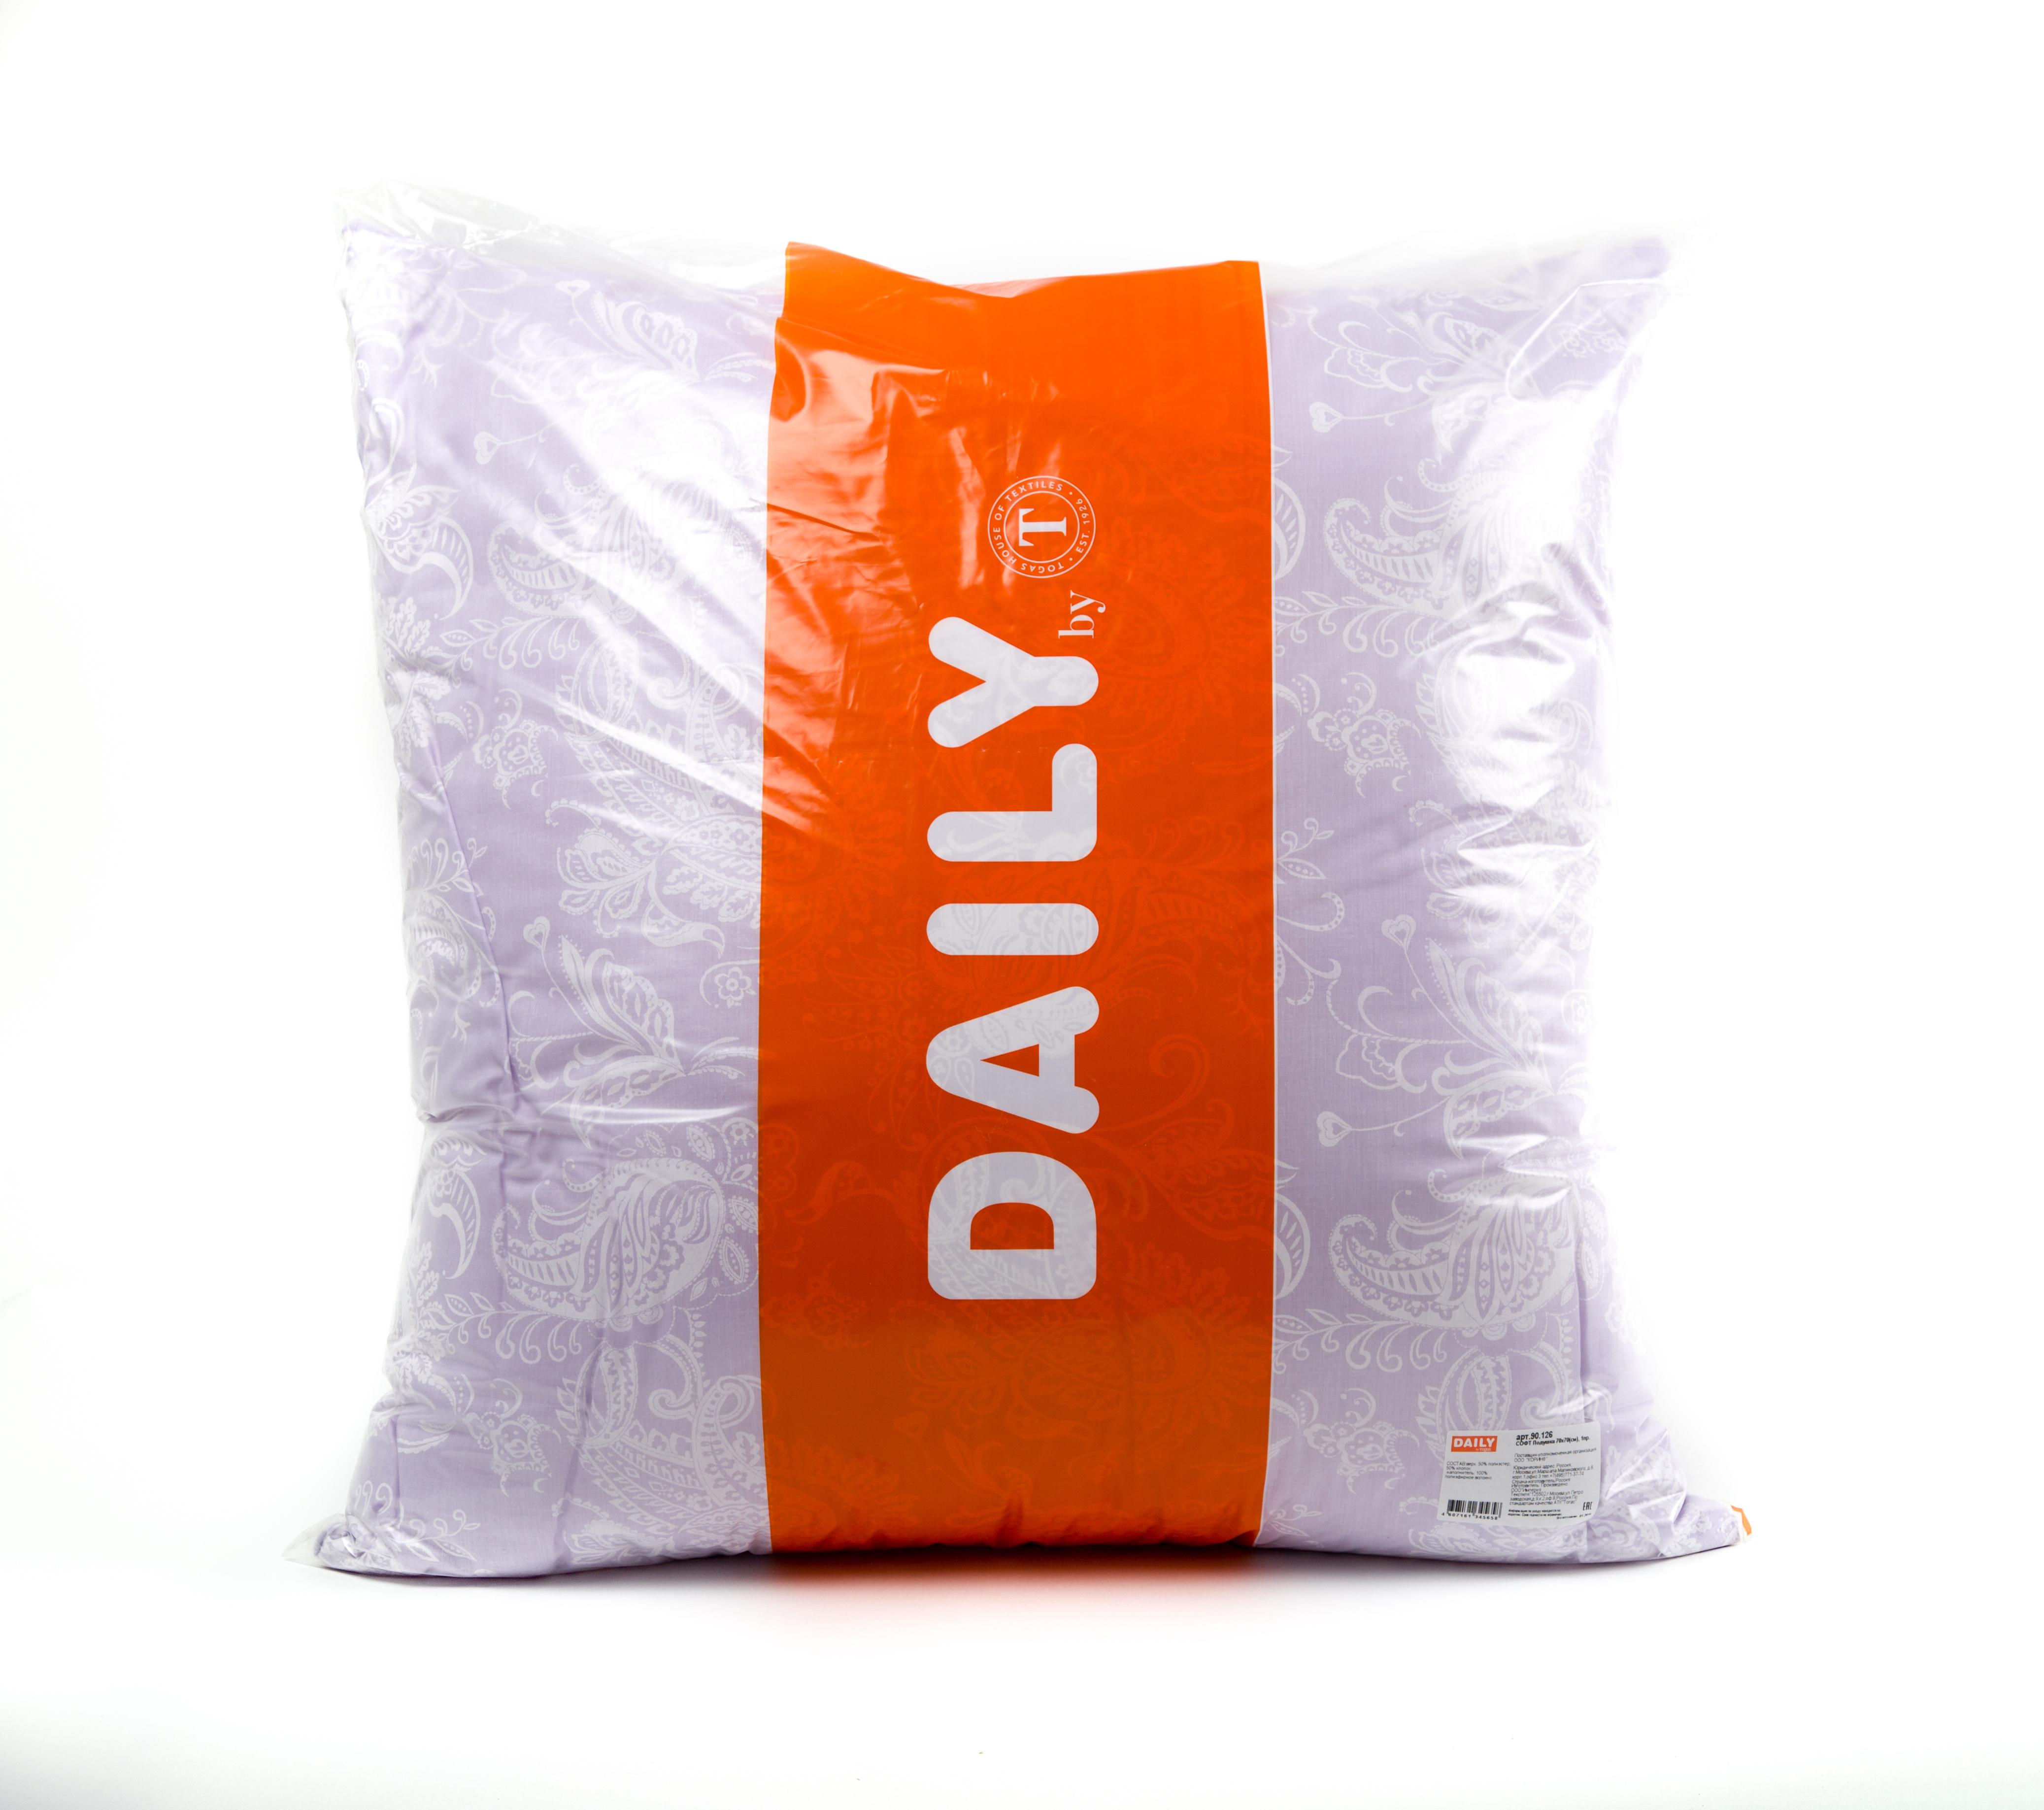 Подушки DAILY by T Подушка Софт (70х70) подушка wendre tencel comfort 70х70 тэнсель 30% полиэстер 70%